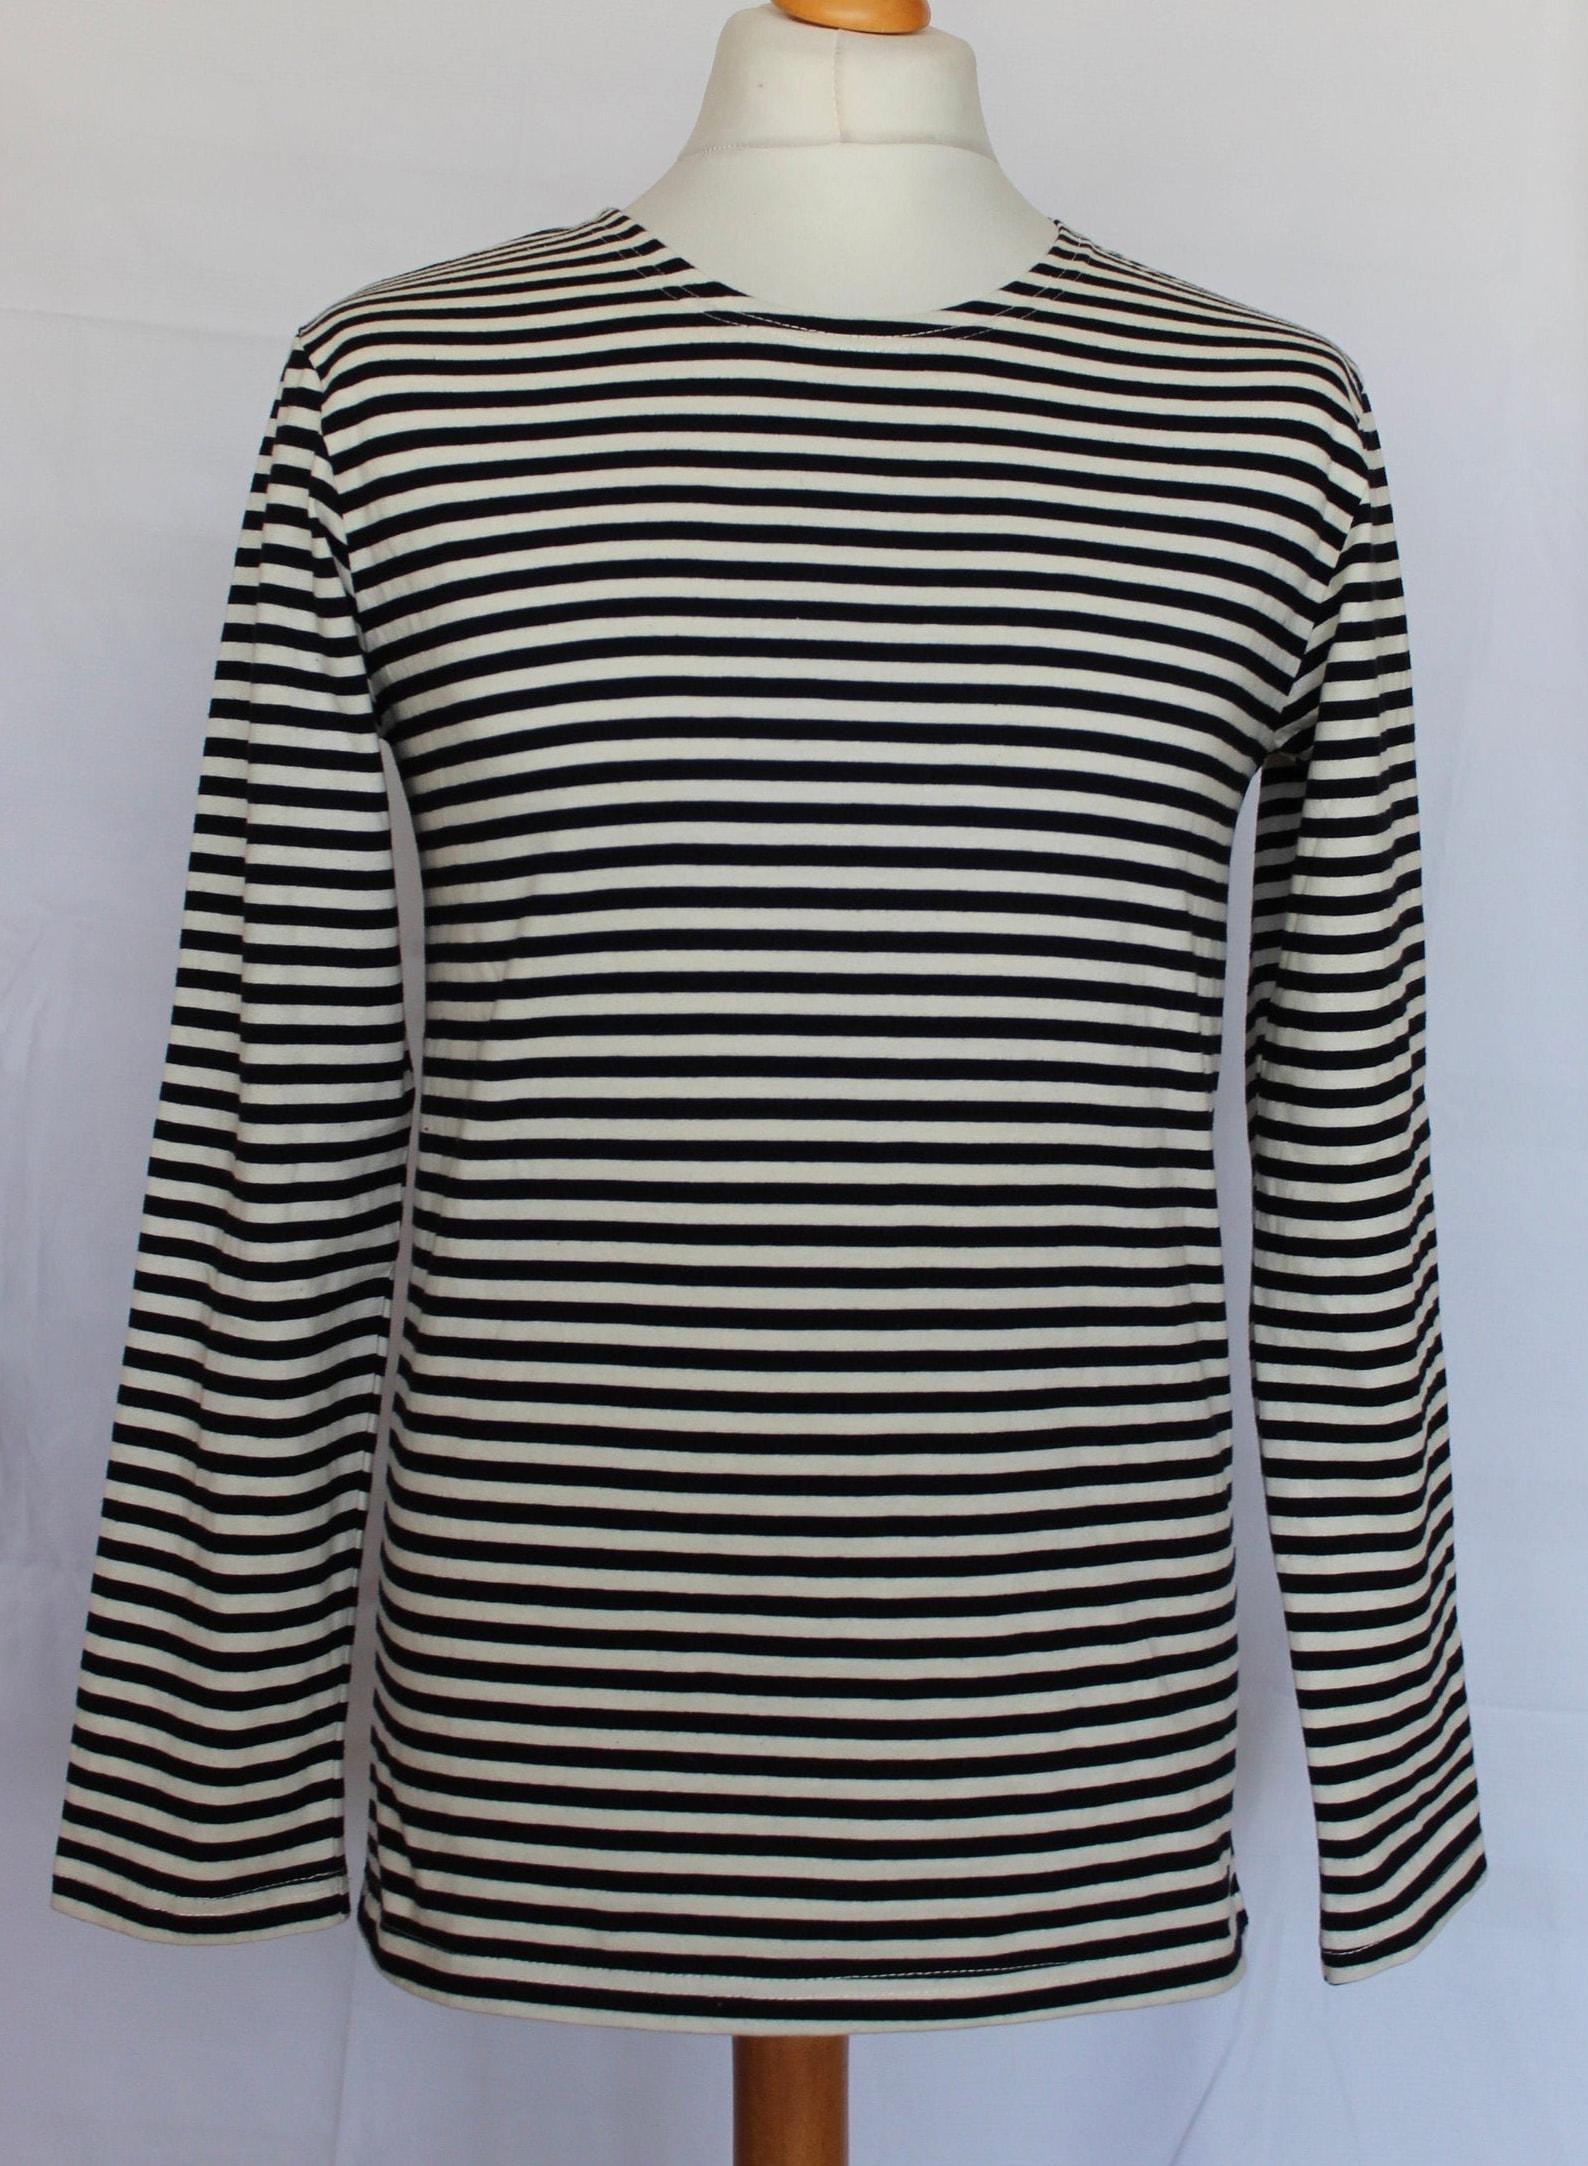 Black and White, Long Sleeve, 100% Woven Cotton, Marine Breton, Unisex Sailors Shirt, S:M:L:XL,